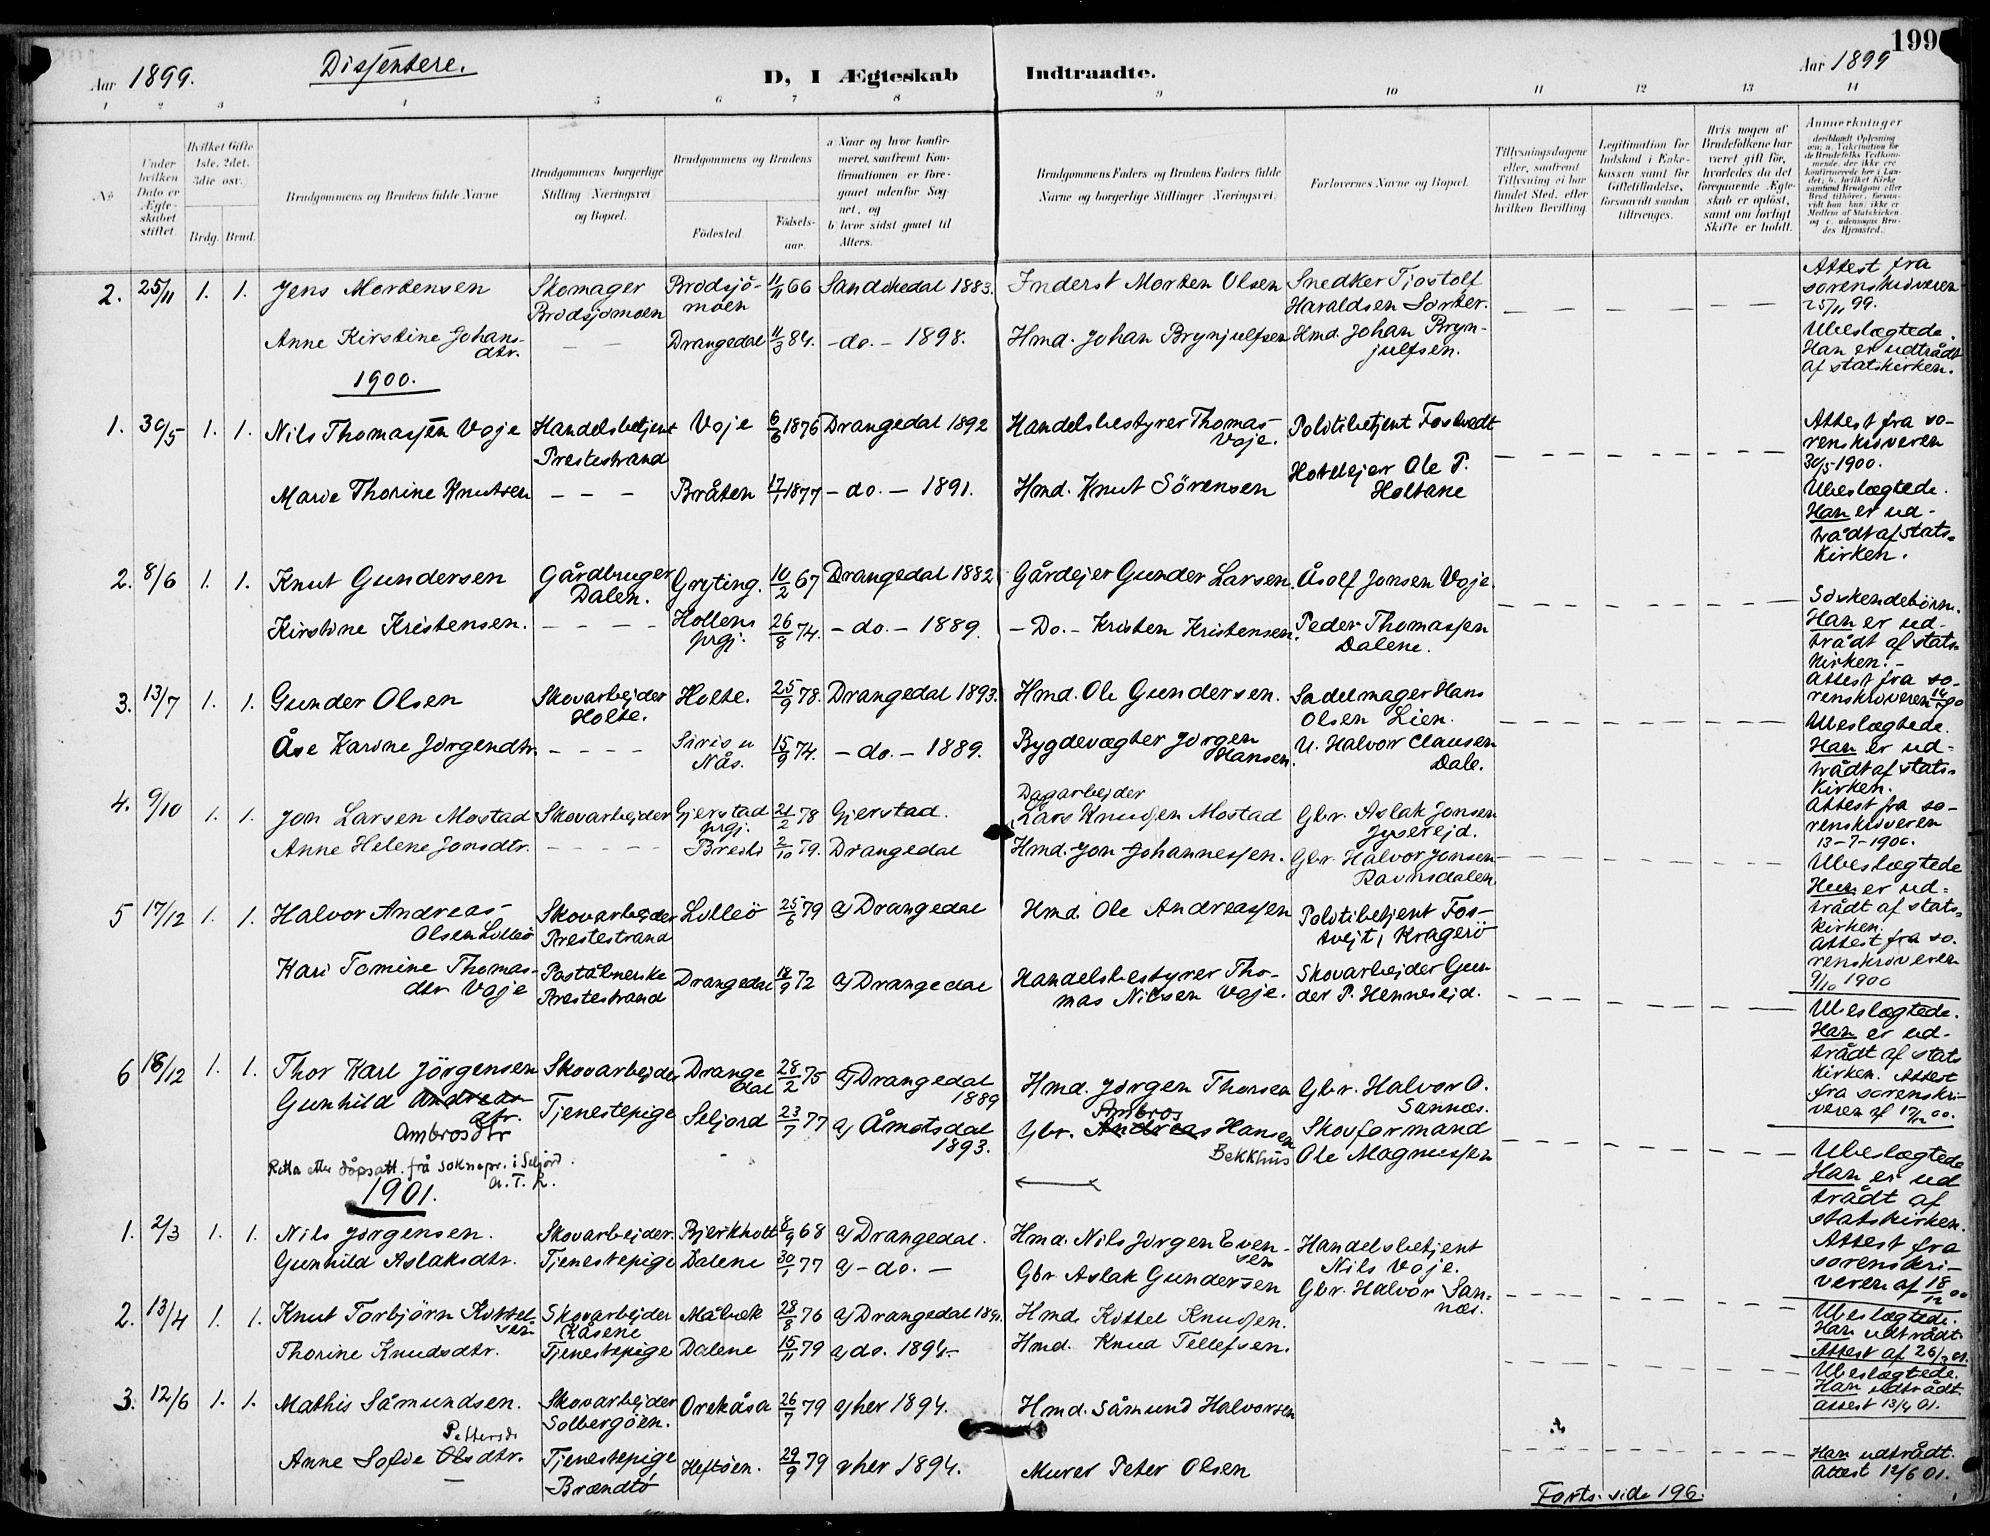 SAKO, Drangedal kirkebøker, F/Fa/L0012: Ministerialbok nr. 12, 1895-1905, s. 199